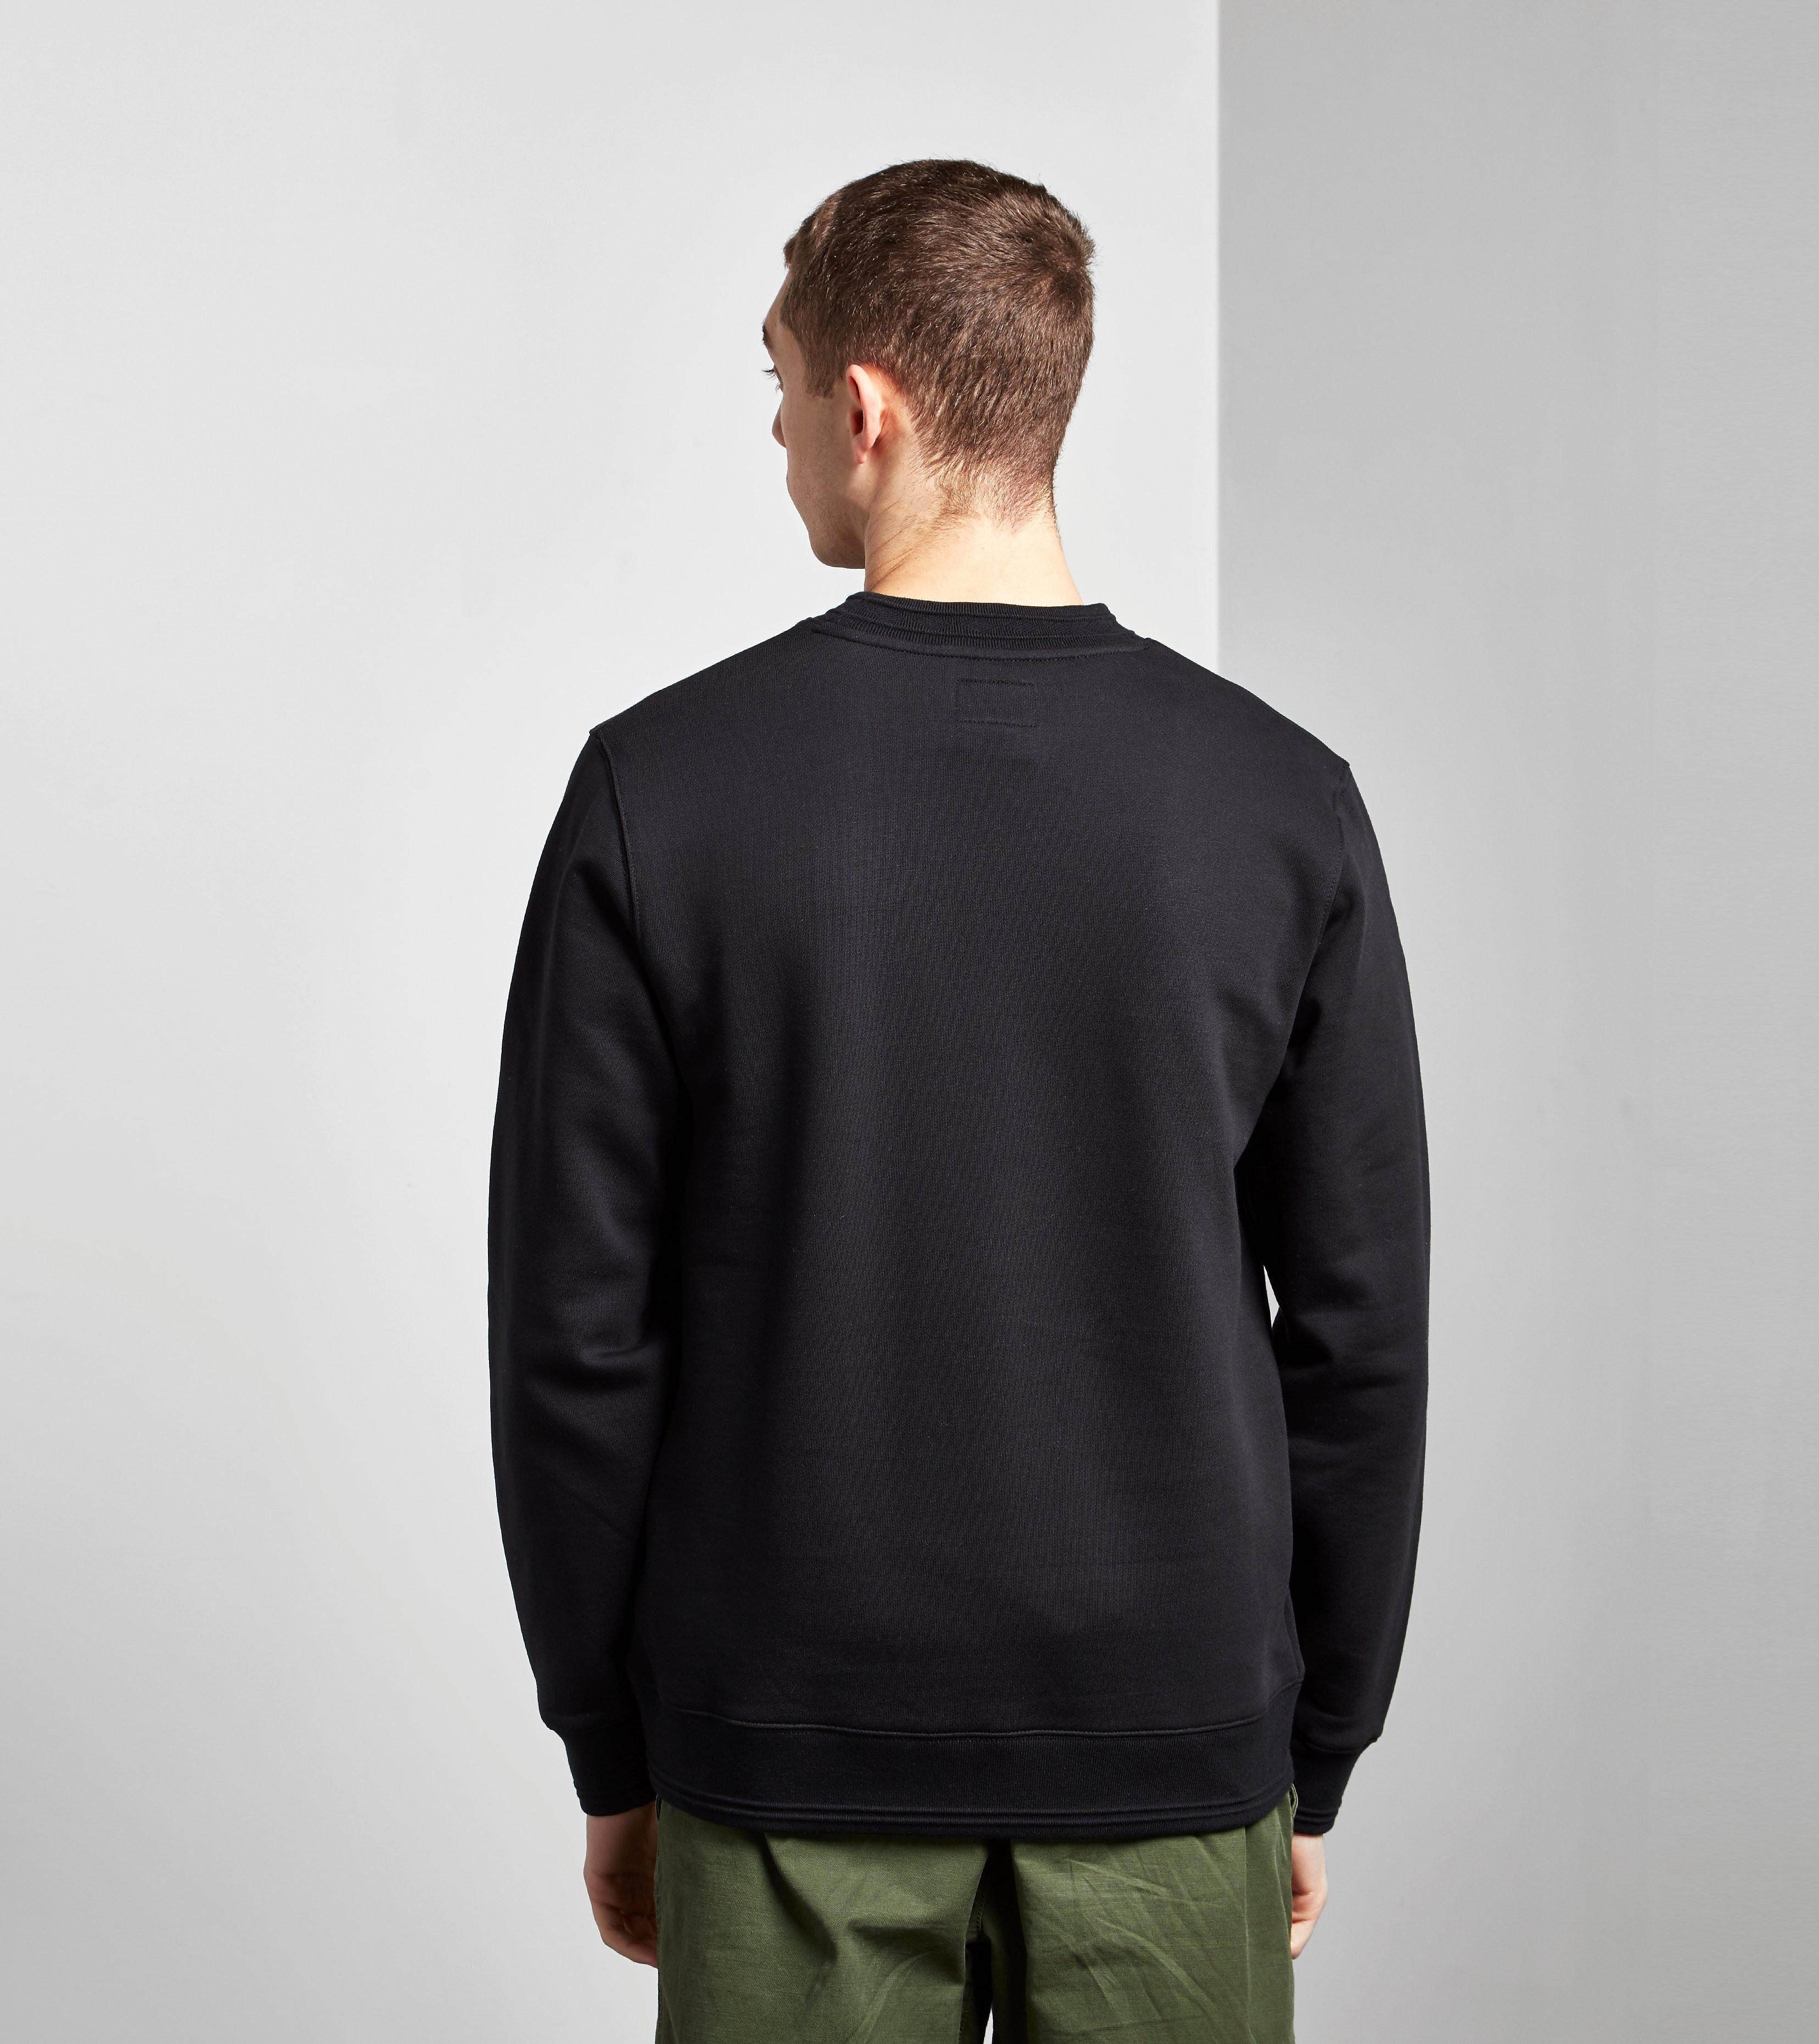 Stussy Jacquard Collar Crew Sweatshirt